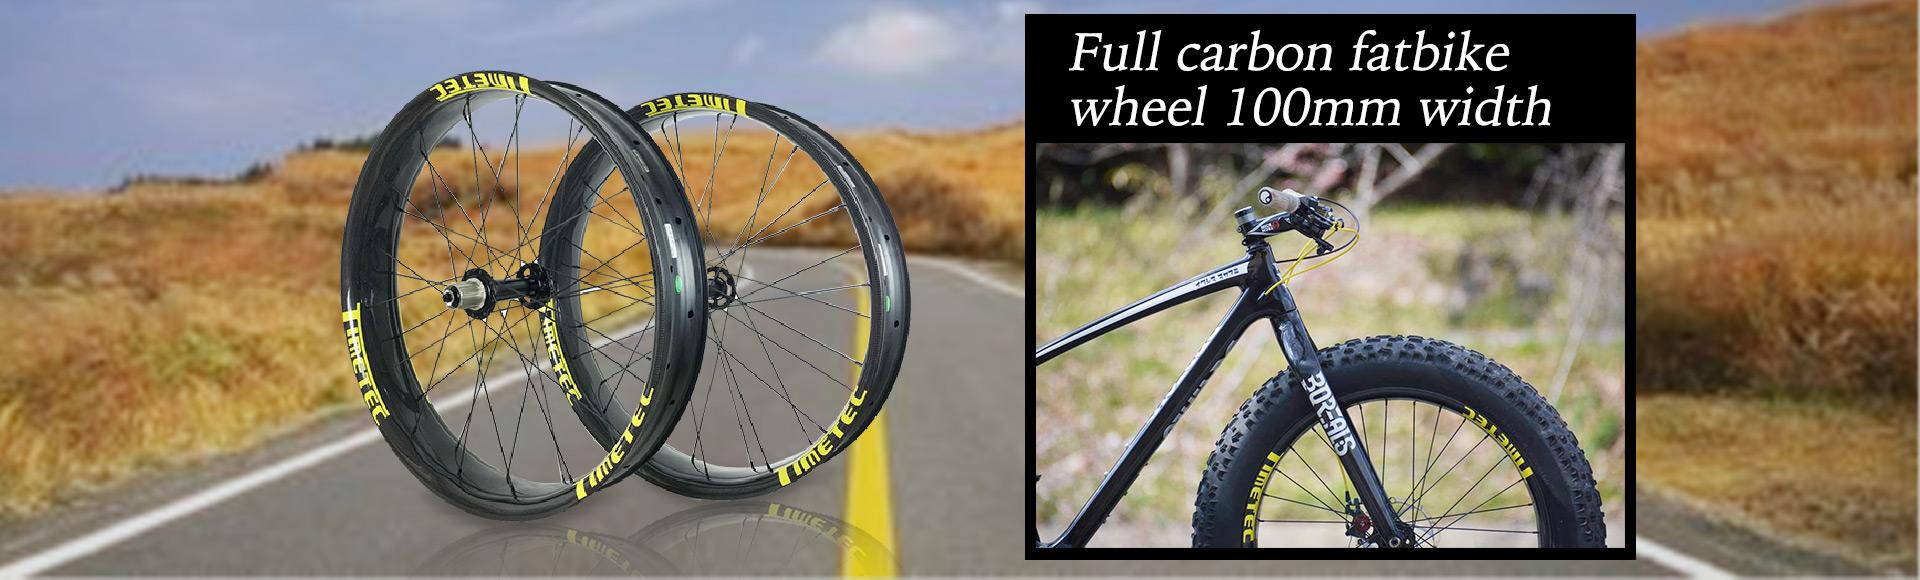 Fat Tire Bike Carbon Fiber Rims Wheels 80mm width 100mm width